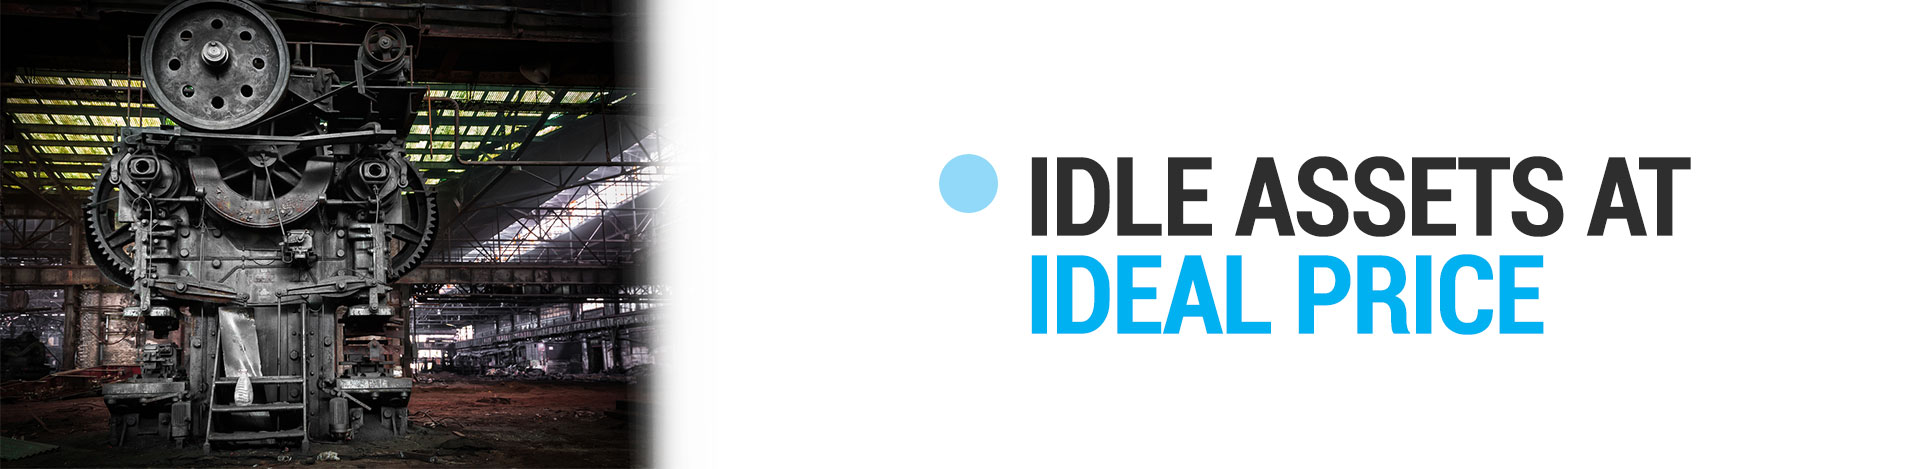 Auction Platforms for Idle-Assets